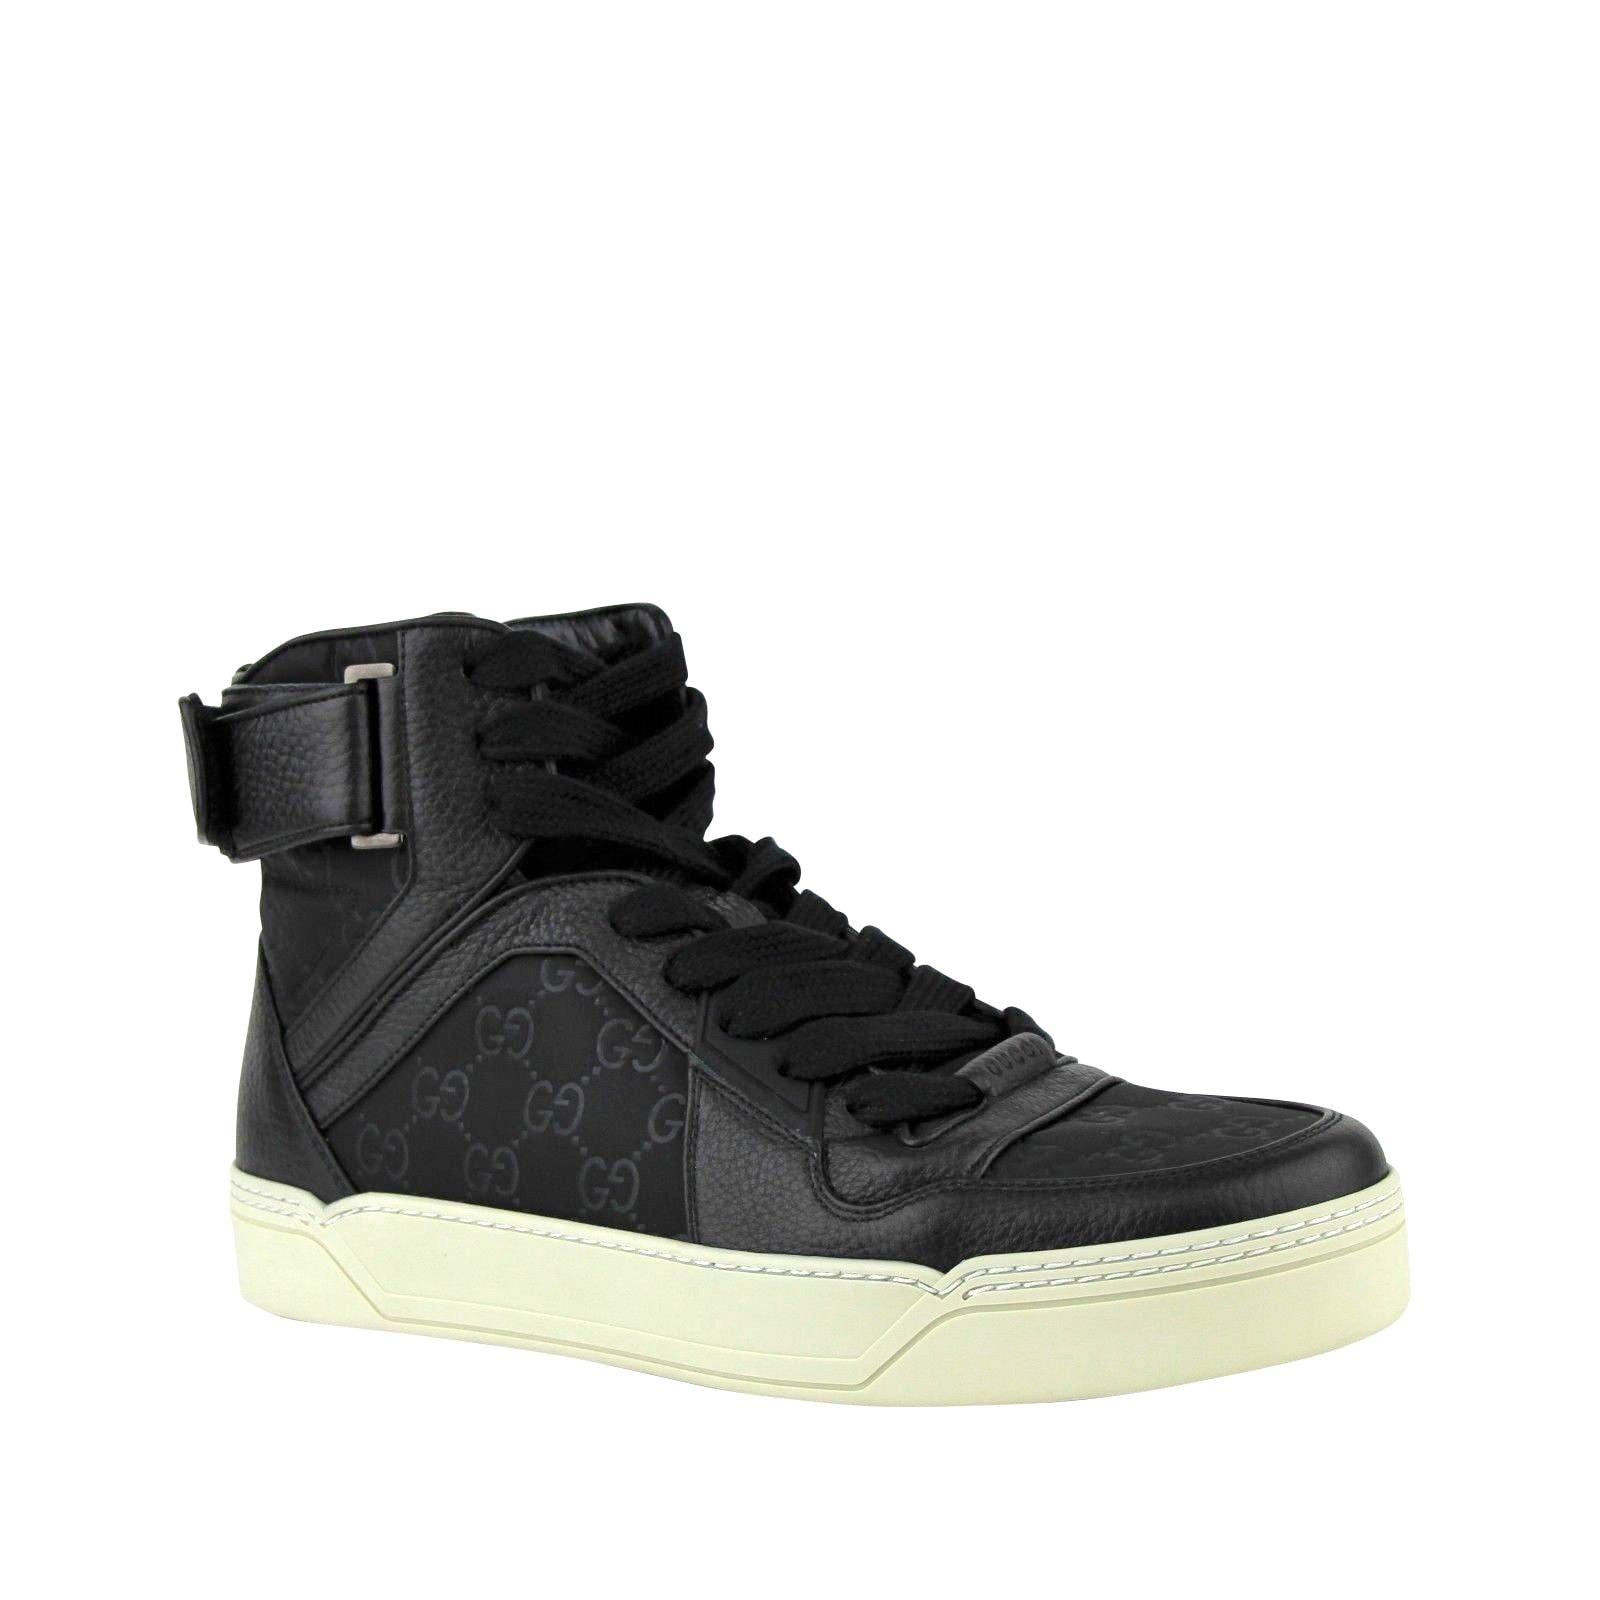 gucci mens high top sneakers